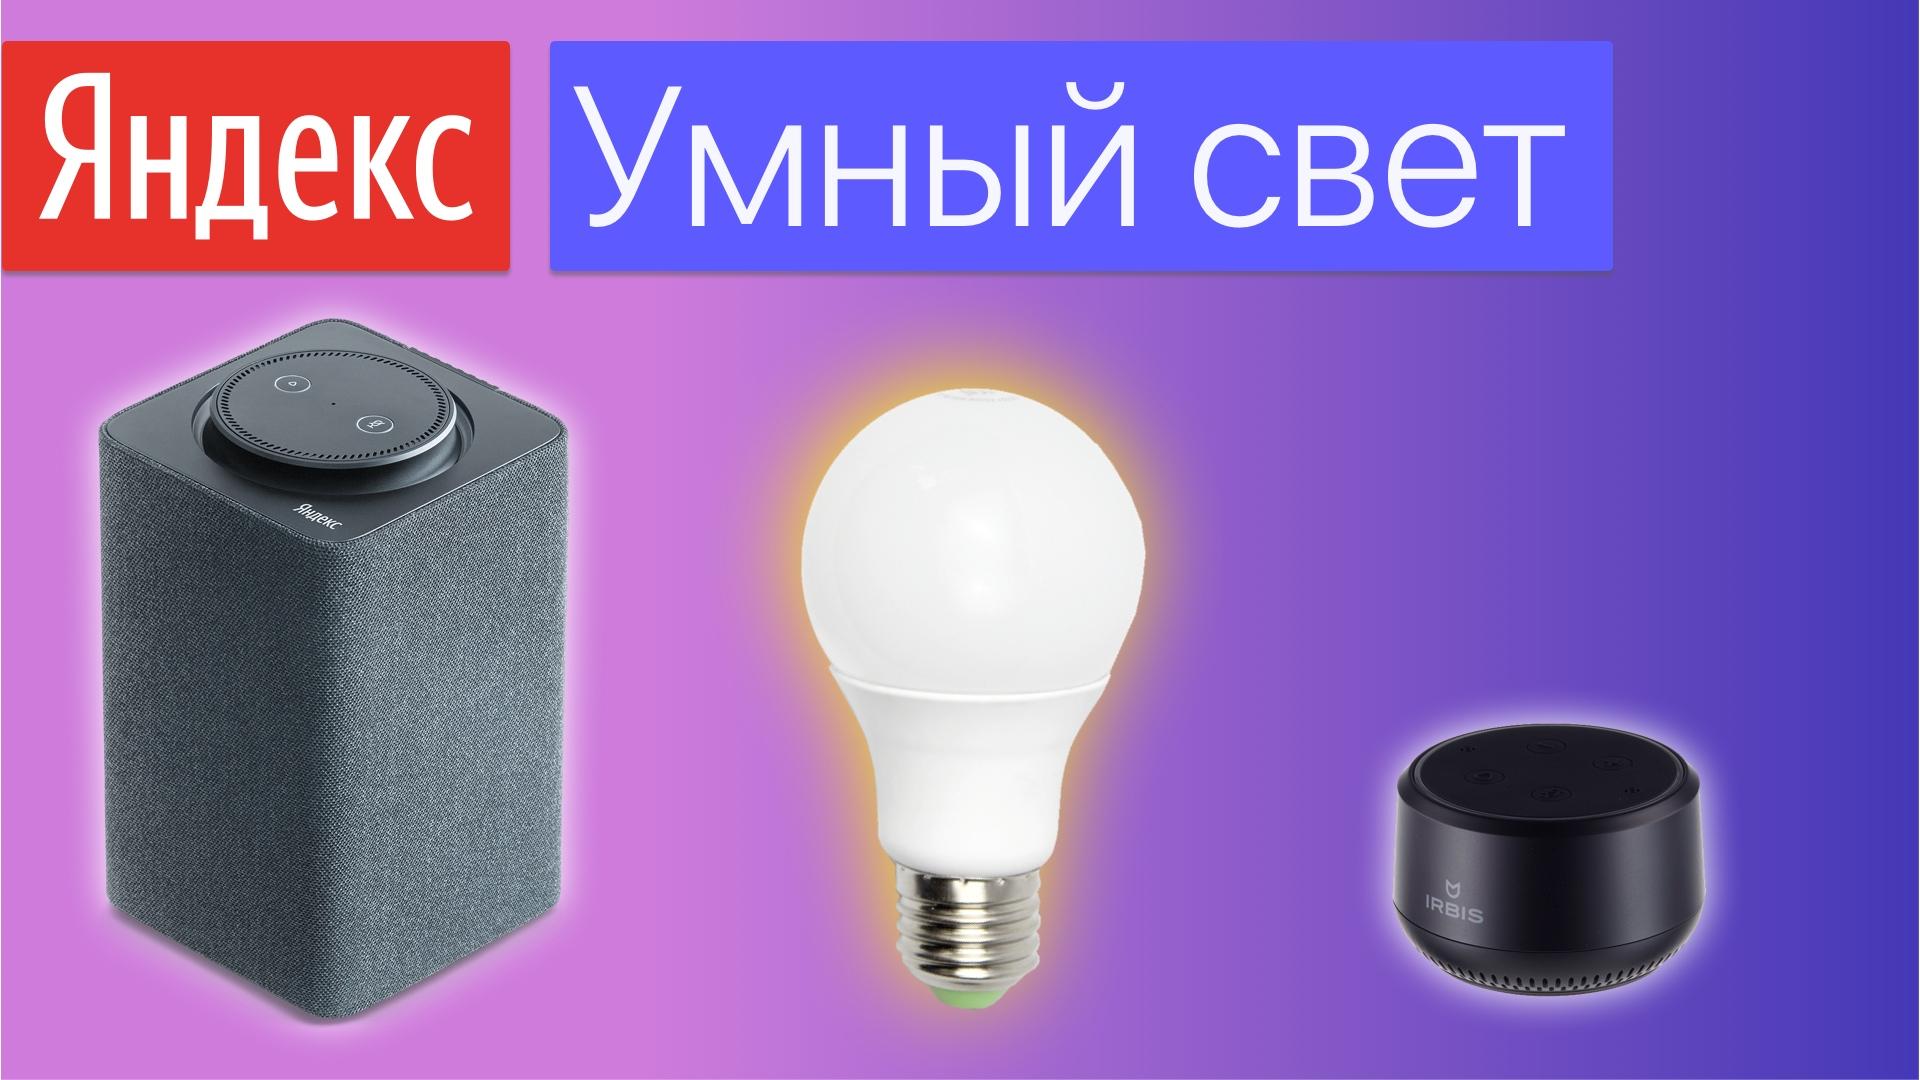 Обзор Yandex Дома и лампочки